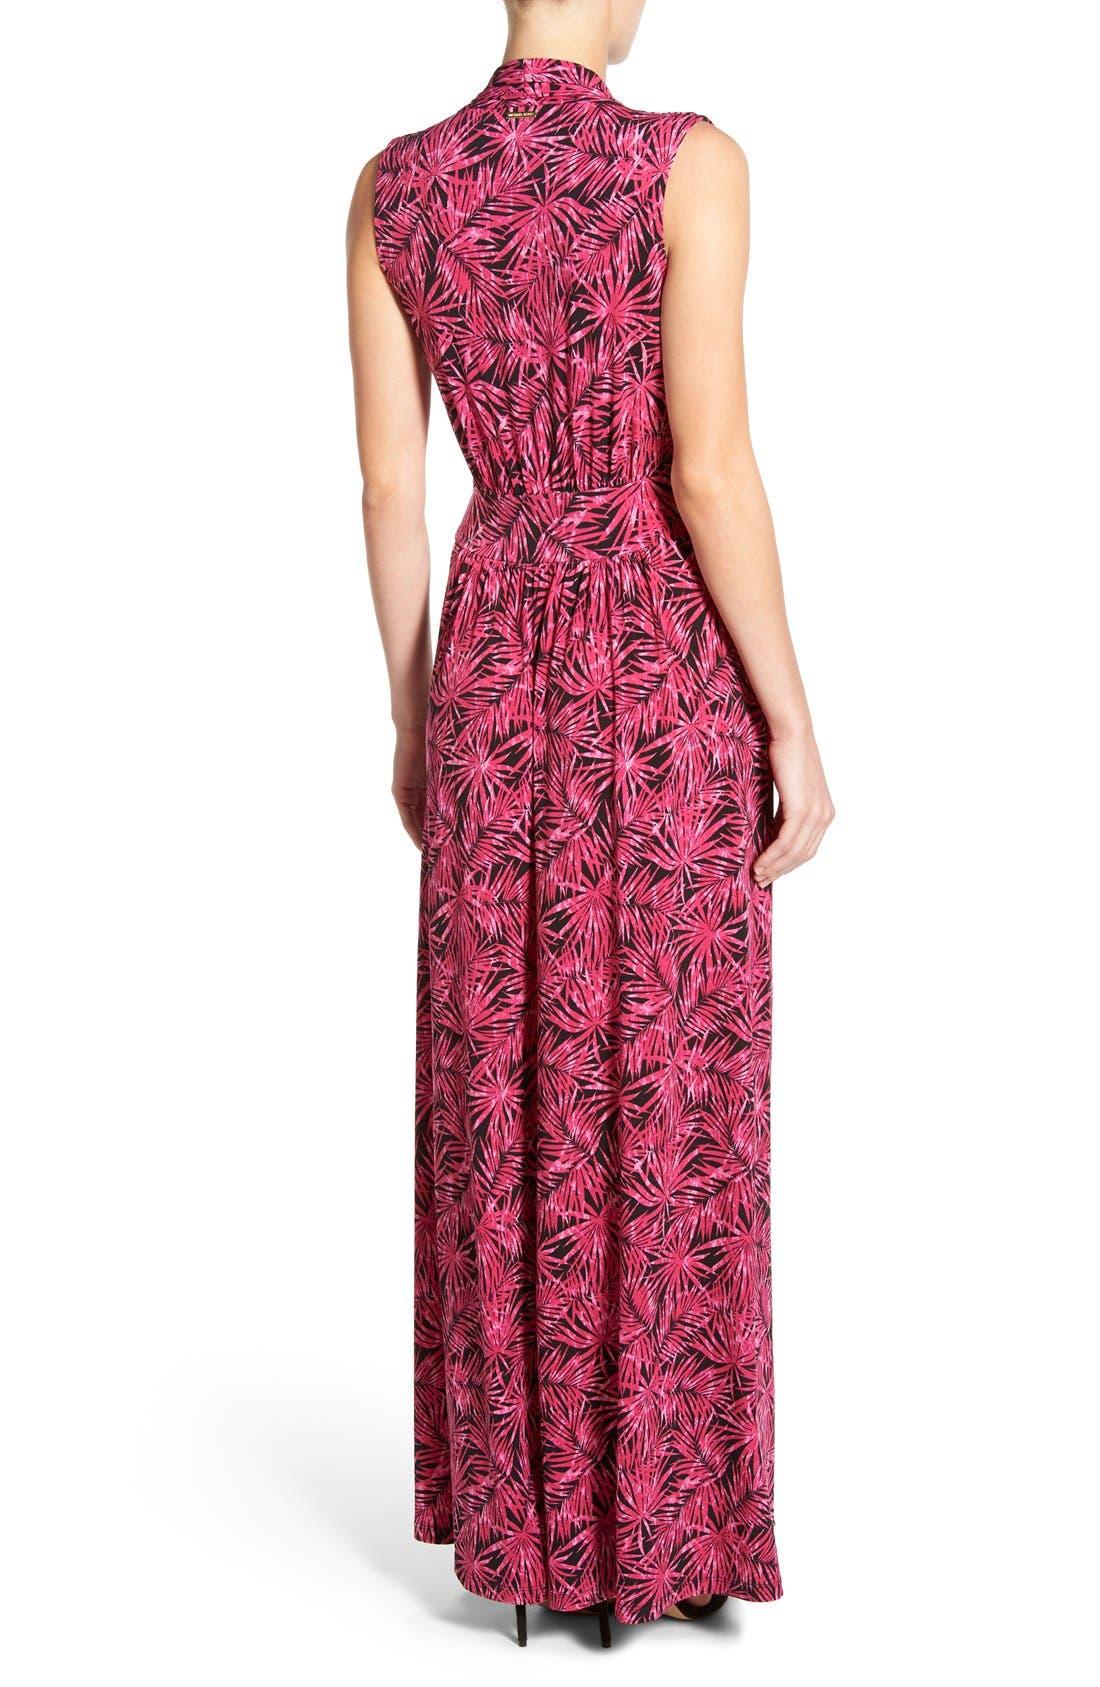 MICHAEL MICHAEL KORS, Print Jersey Side Slit Maxi Dress, Alternate thumbnail 5, color, 660